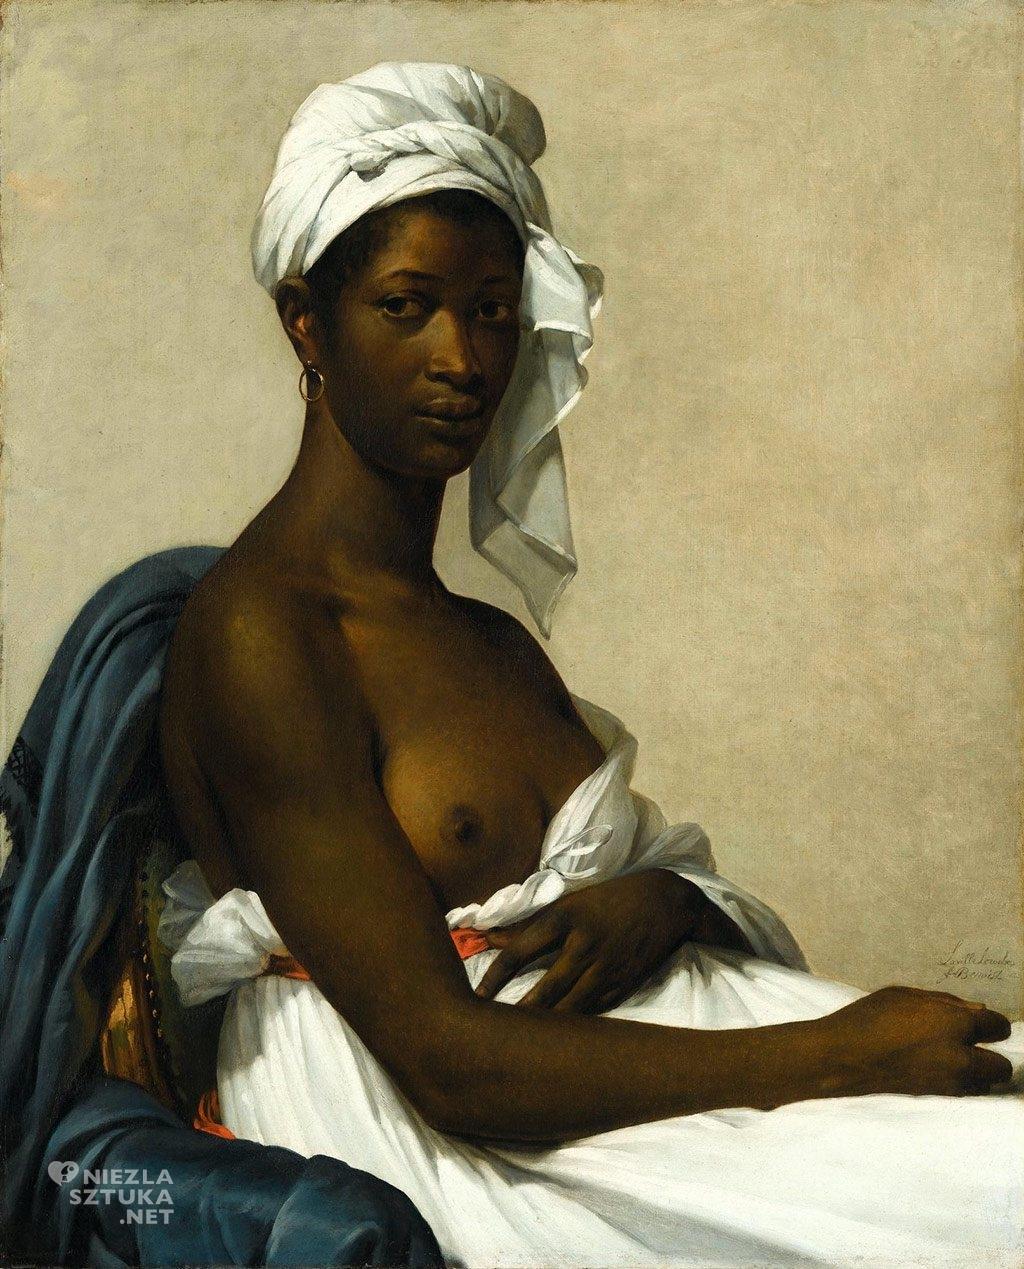 Marie-Guillemine Benoist, Portret murzynki, portret, francuska malarka, Niezła sztuka